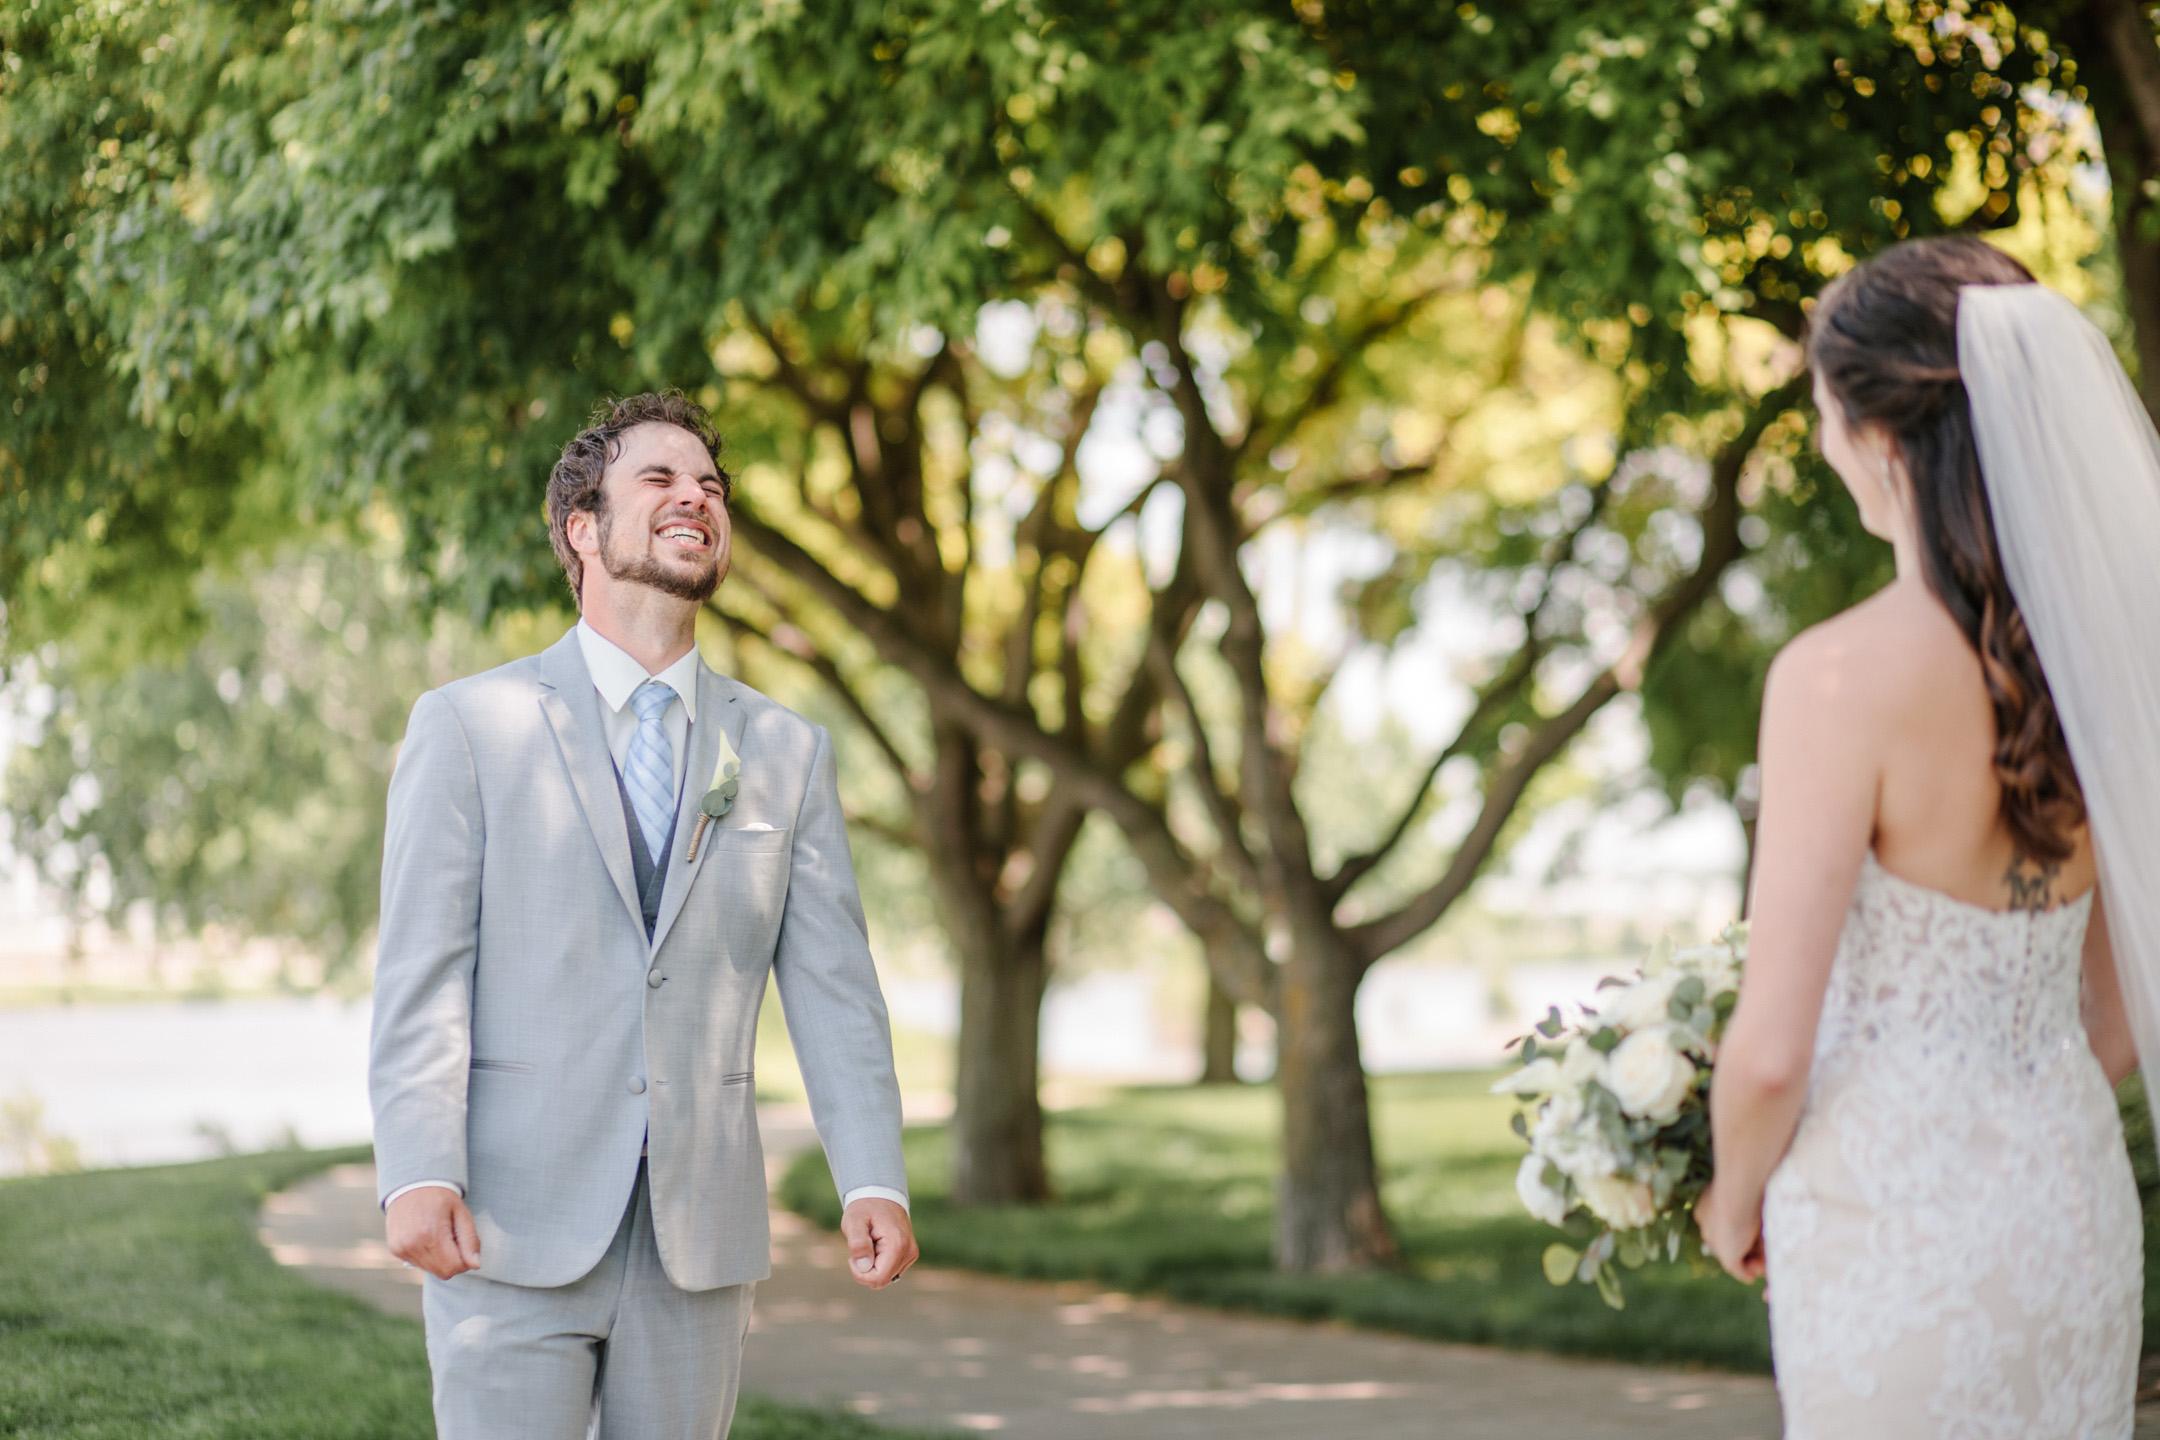 amelia-renee-photography-sioux-city-iowa-wedding-first-look-05.jpg